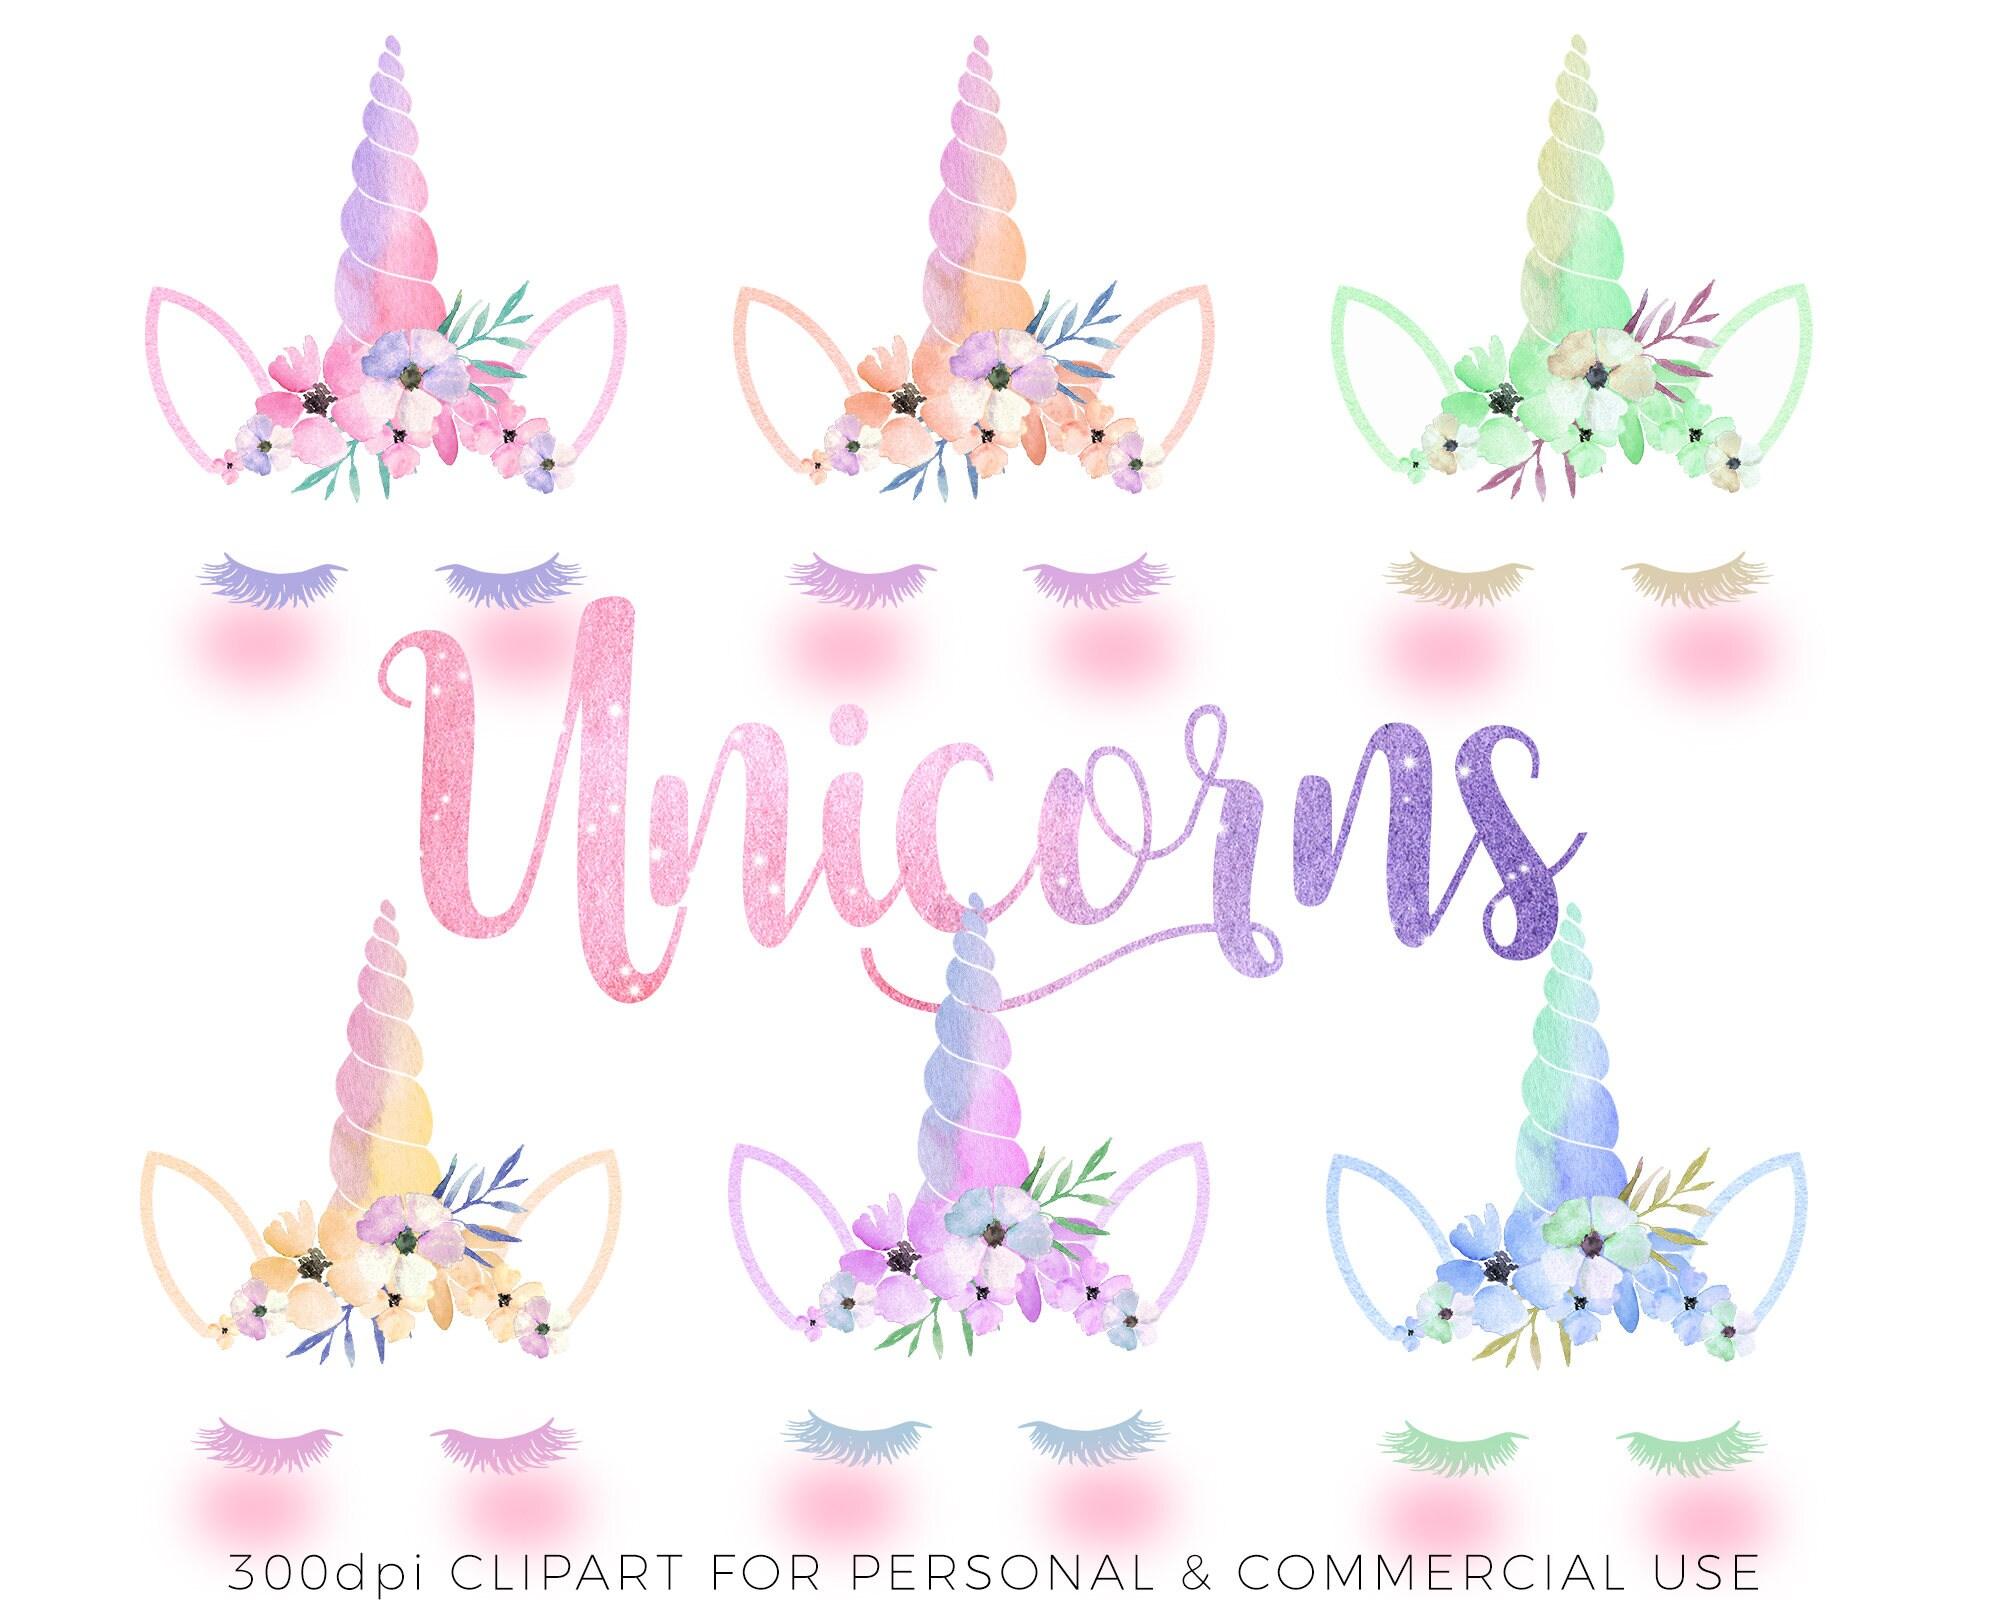 6 X Cute Watercolor Magical Unicorn Face Clip Art Images